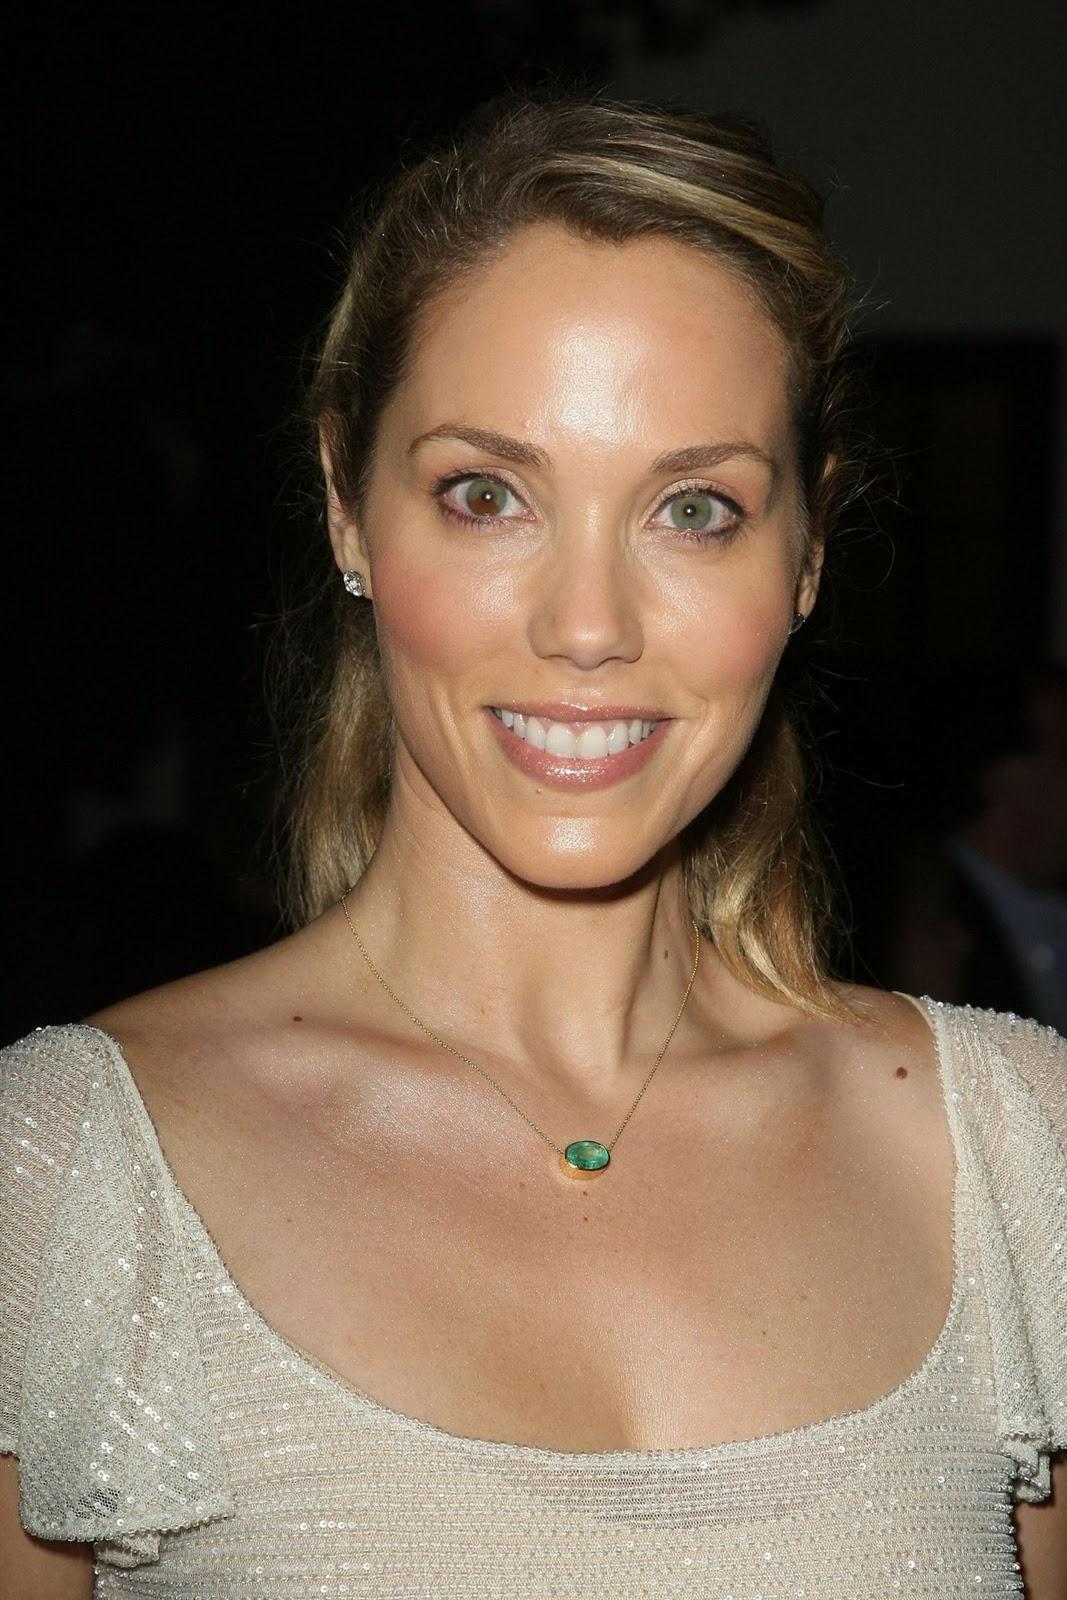 http://4.bp.blogspot.com/_hwxrNi0E-Zc/TQZNBDCmrkI/AAAAAAAAATc/EmME9L2AHP4/s1600/Elizabeth-Berkley-heterochromia-iridum.jpg